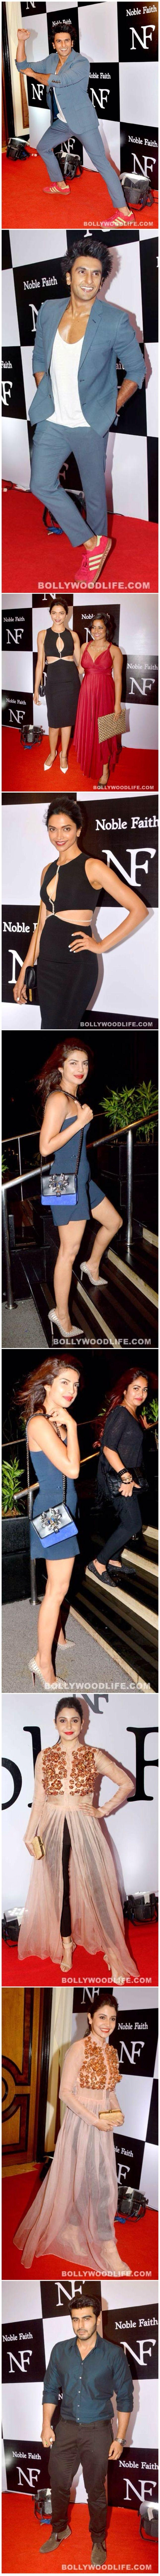 Ritesh Sidhwani birthday bash: The goofy Ranveer Singh, stylish Deepika Padukone and sexy Priyanka Chopra.